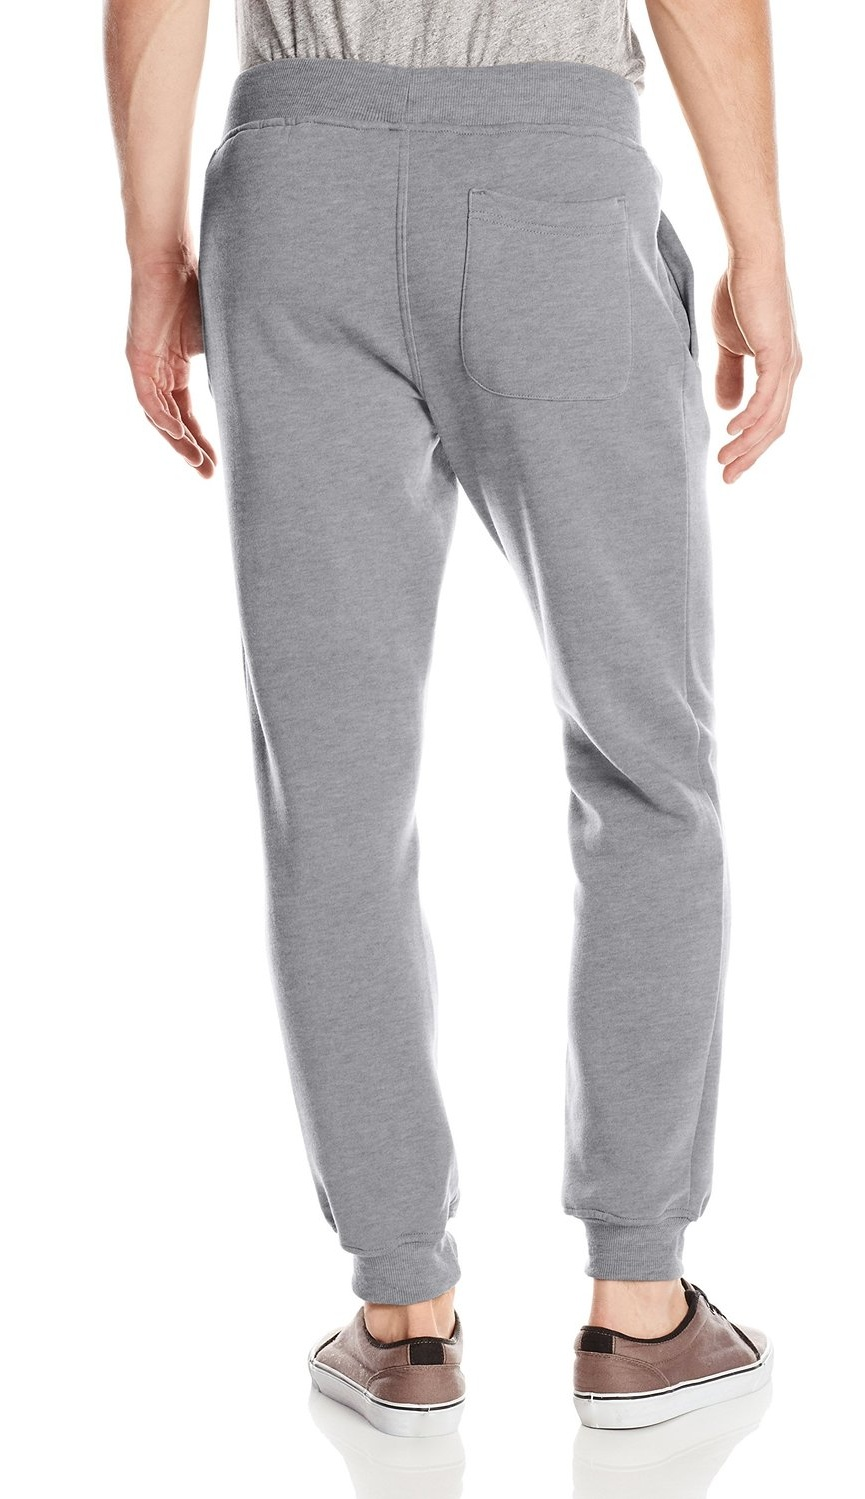 Southpole Mens Active Basic Jogger Fleece Pants-Reg and Big /& Tall Sizes